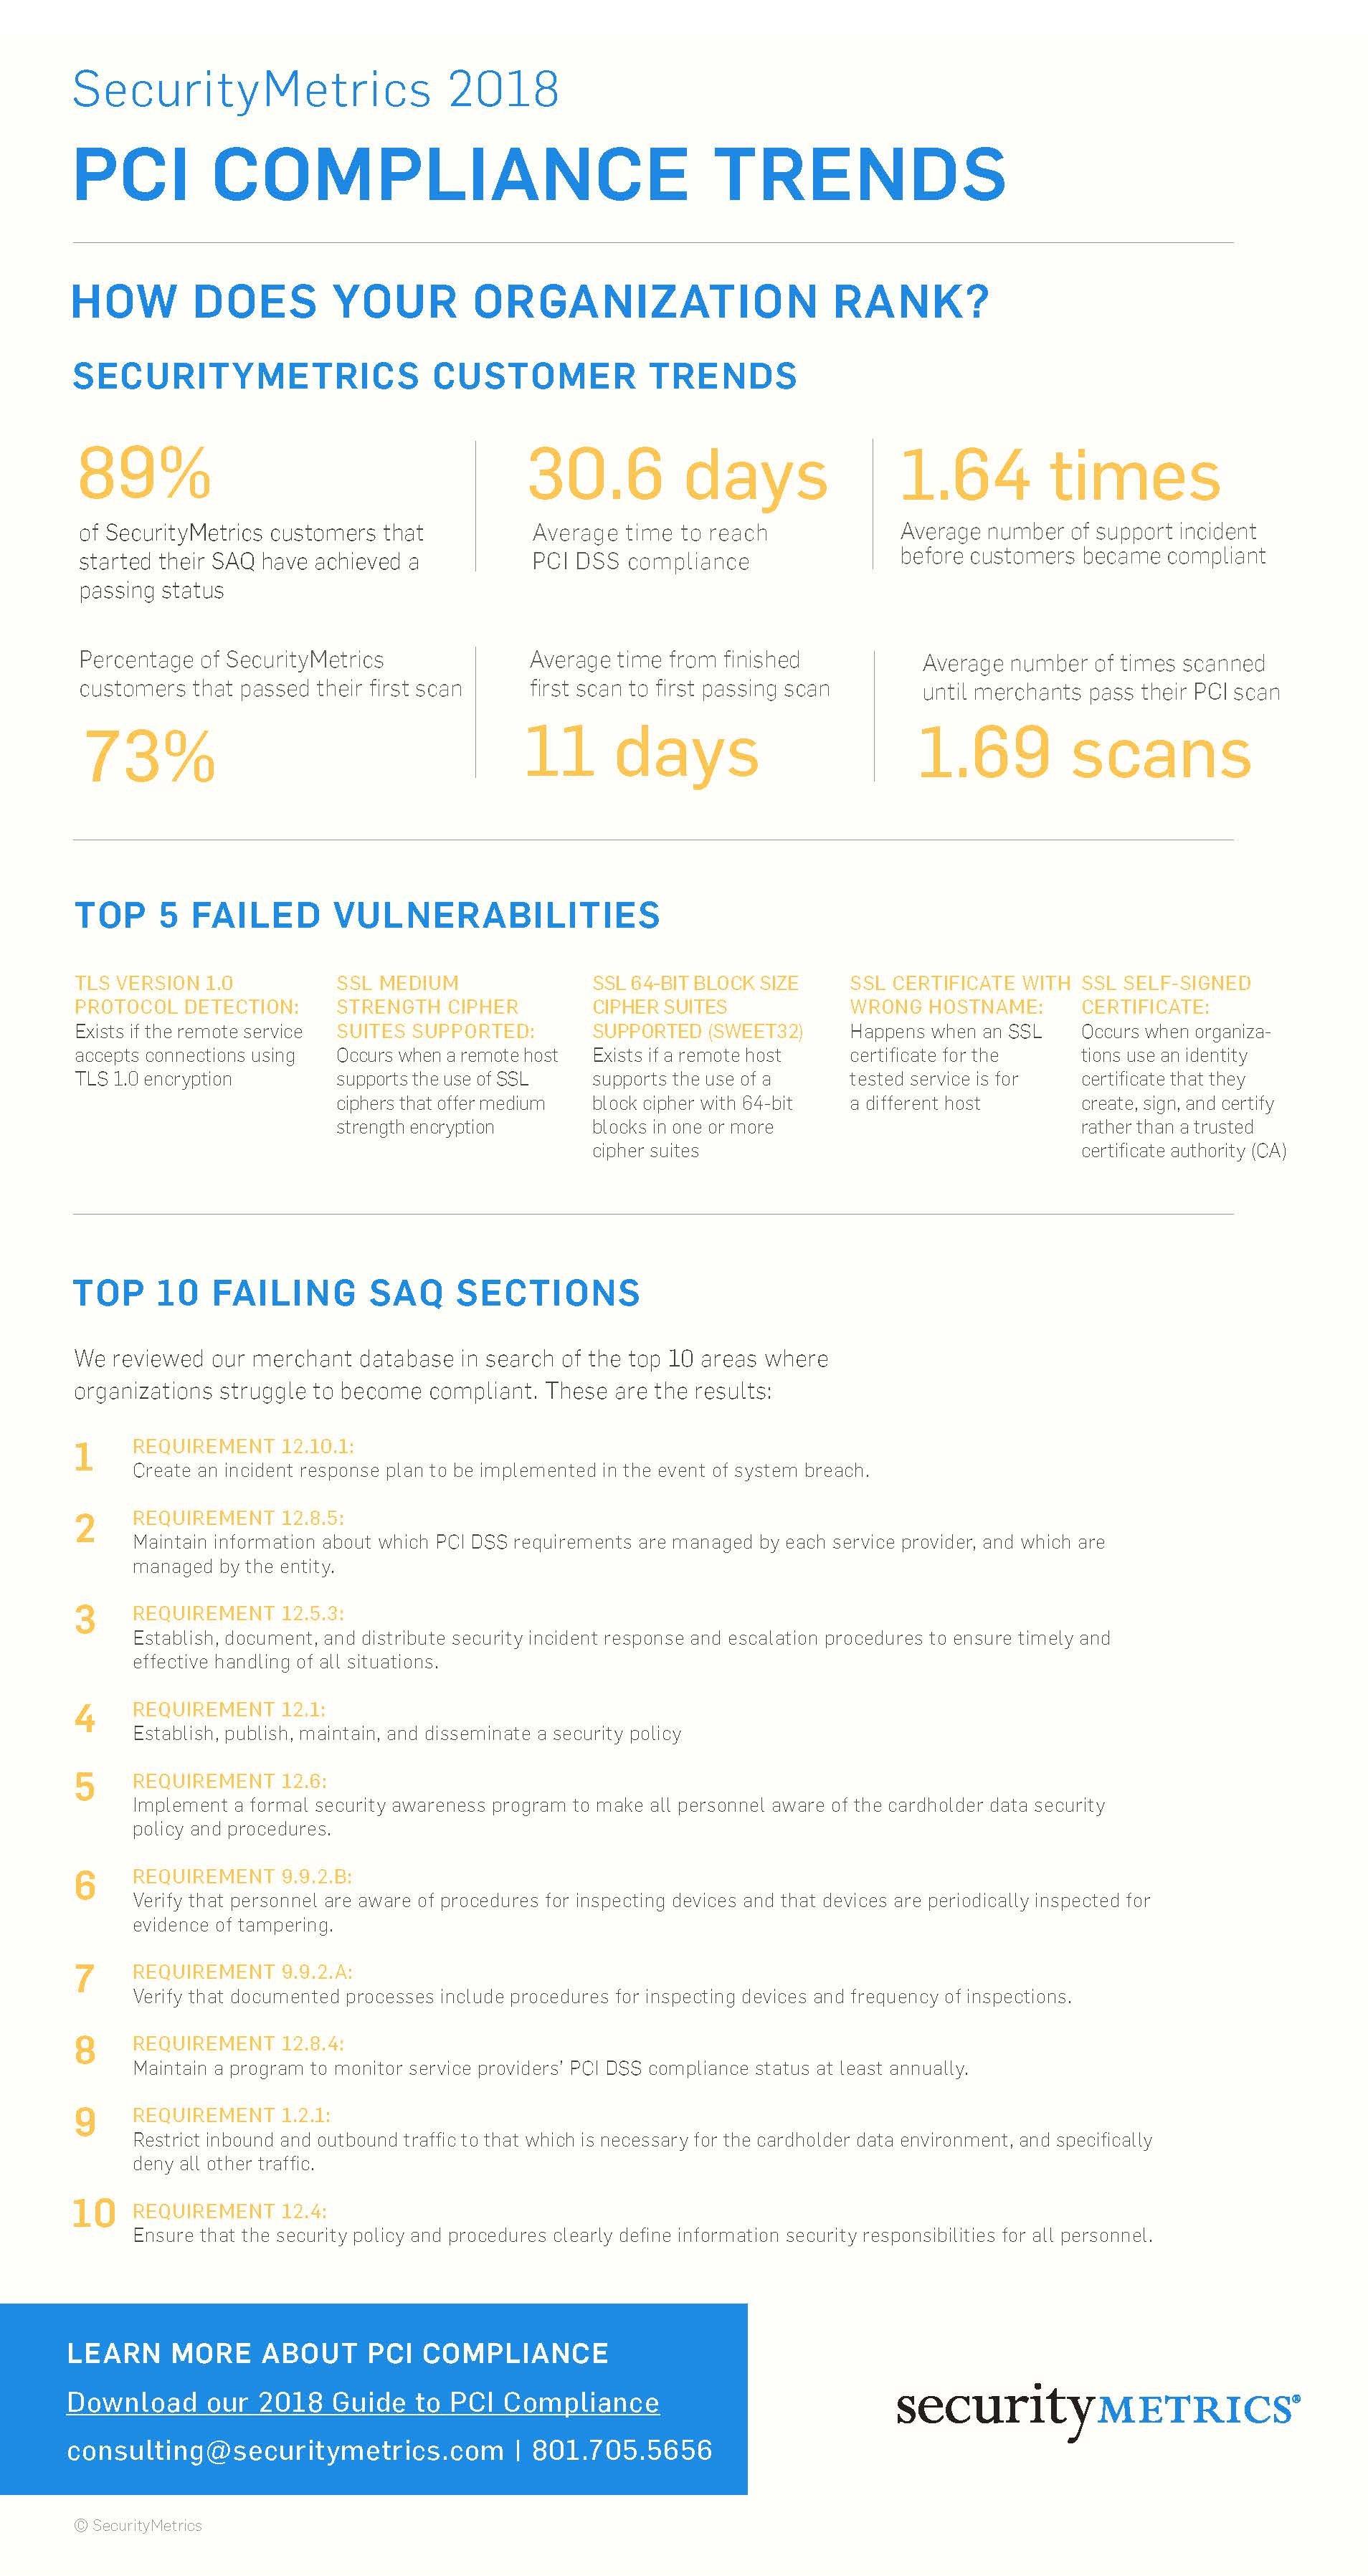 2018 PCI Compliance Trends